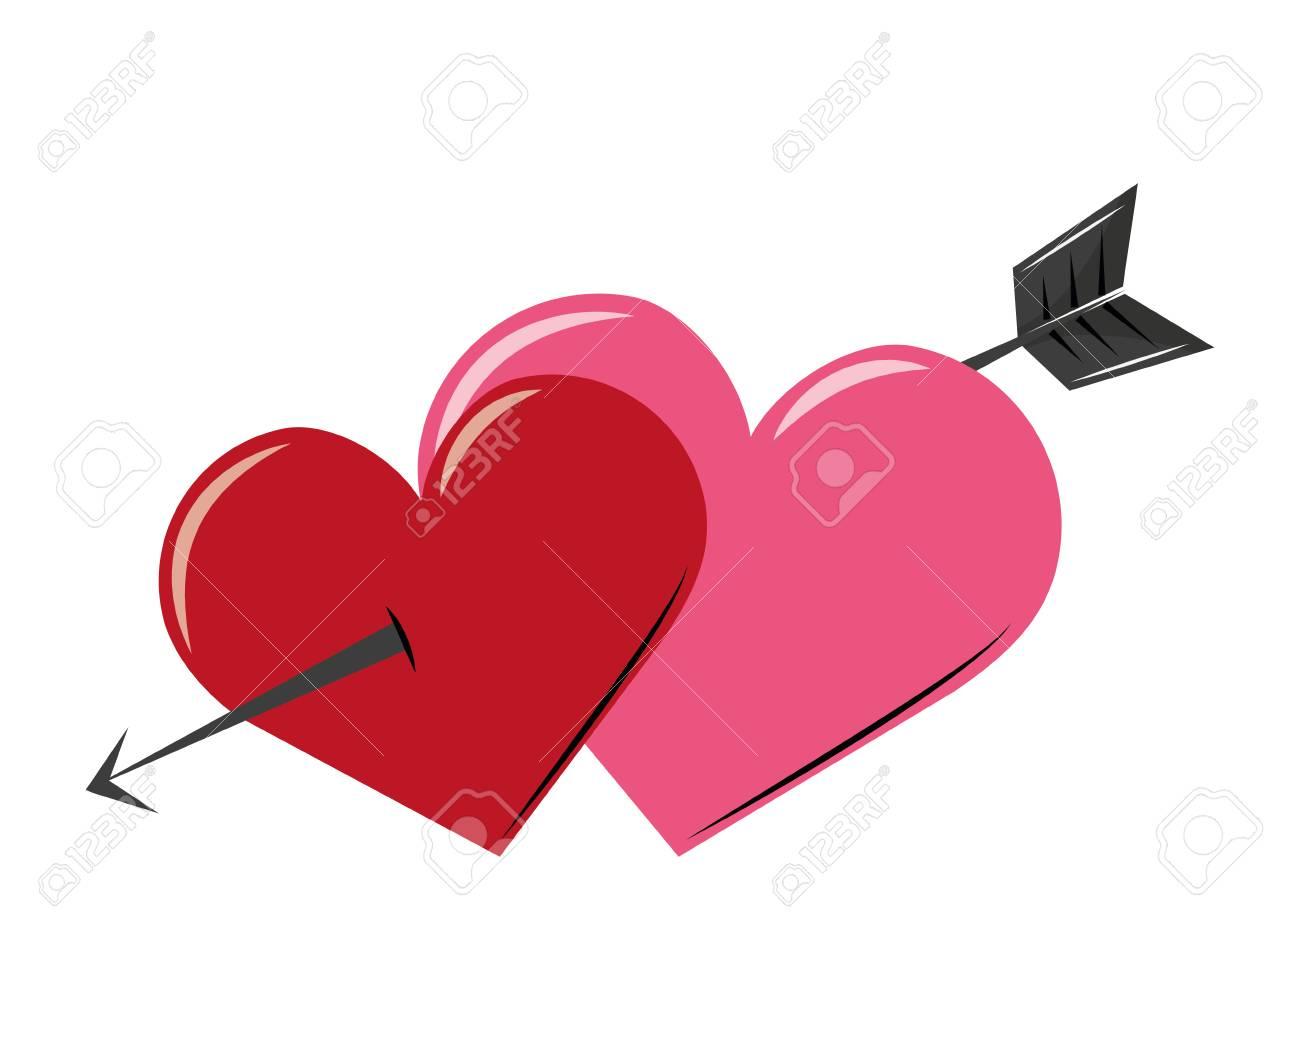 Arrow through hearts love cartoon vector illustration graphic design Banque d'images - 112048481